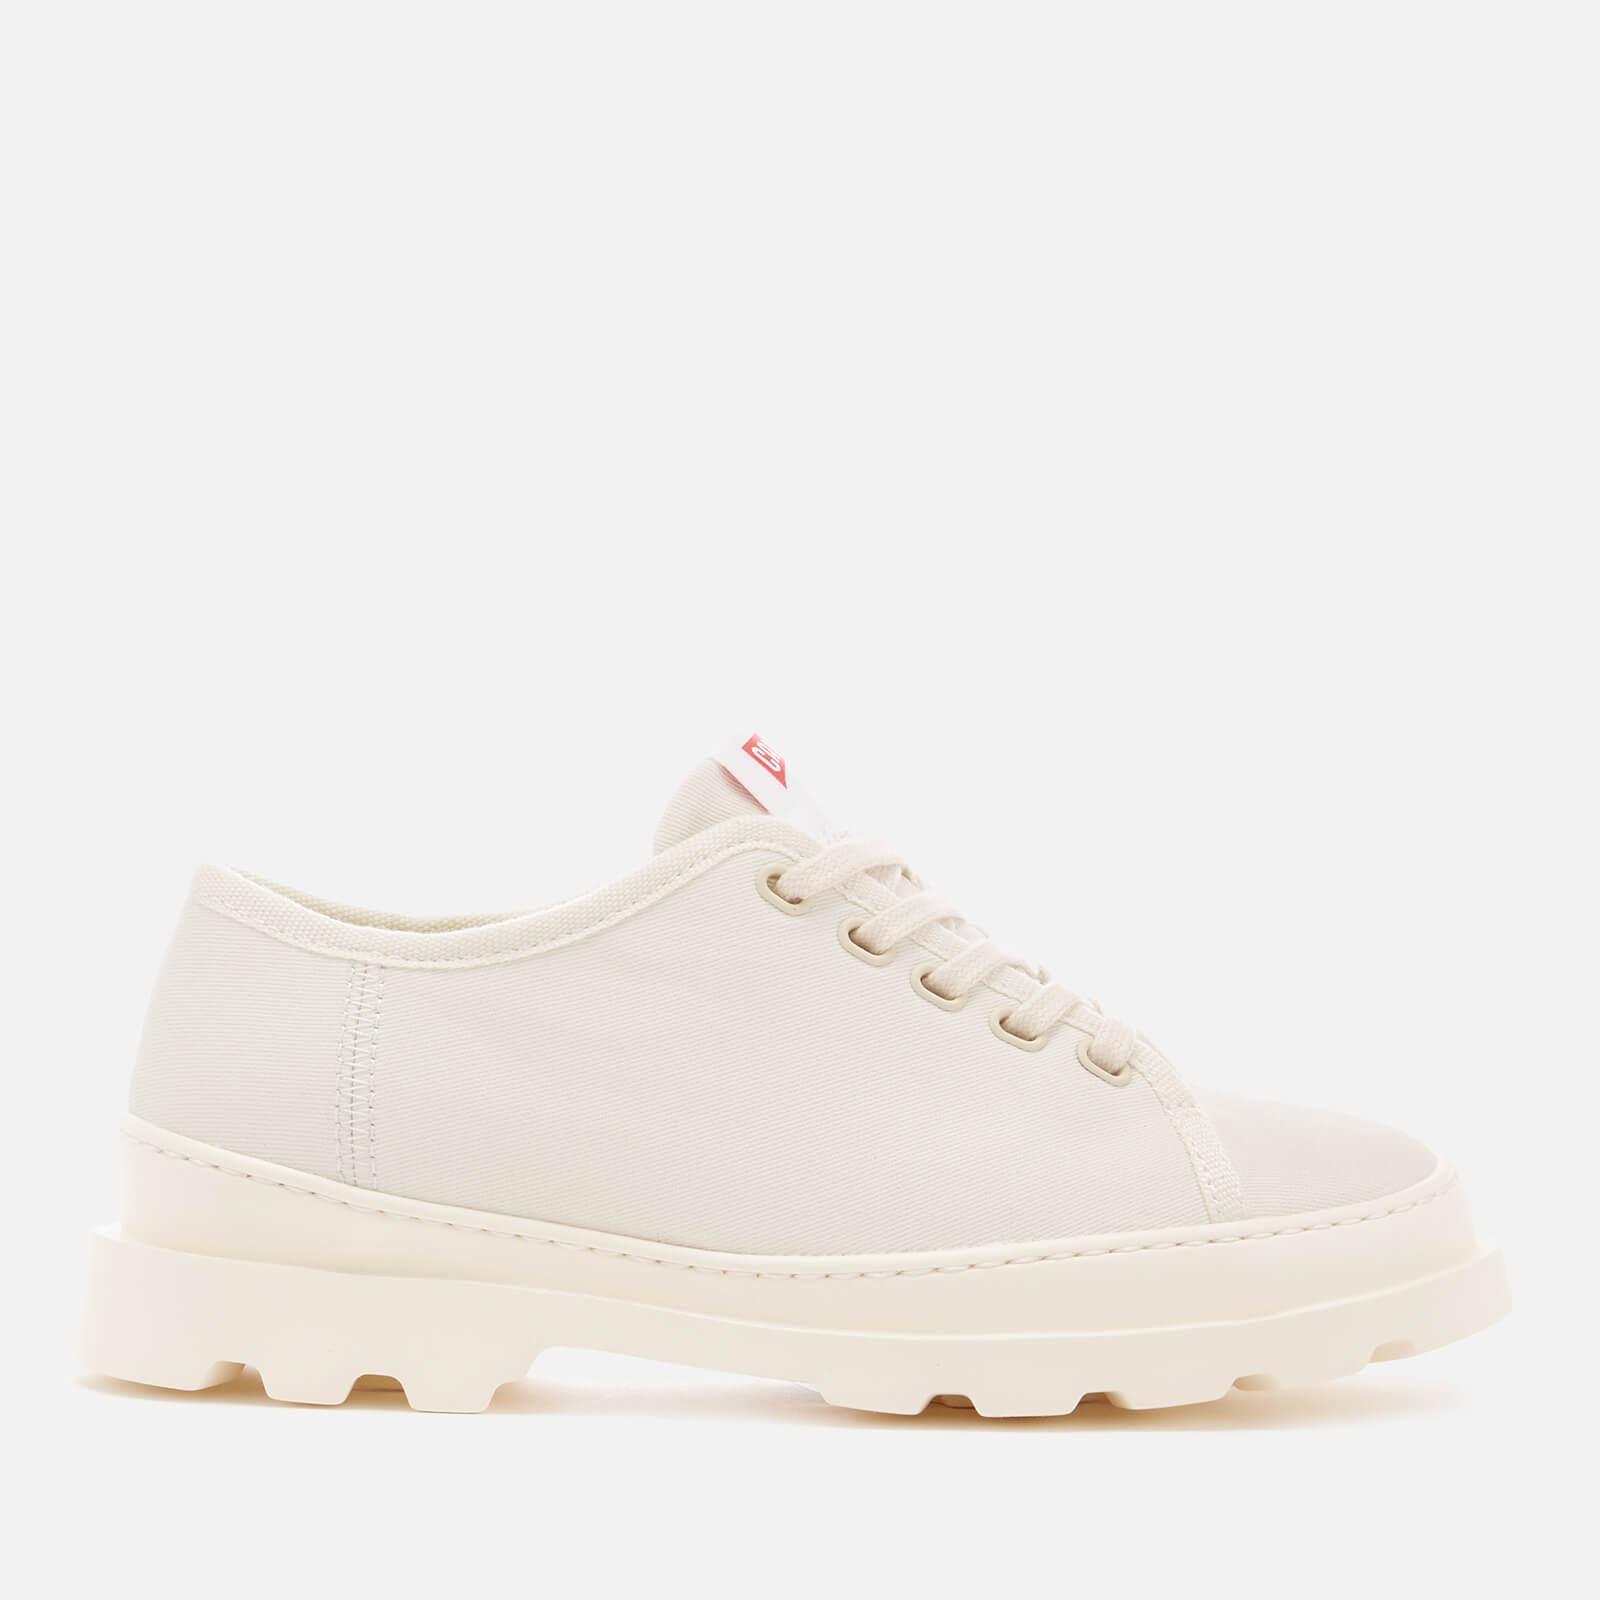 Camper Women's Brutus Canvas Shoes - Light Beige - UK 7 - Beige